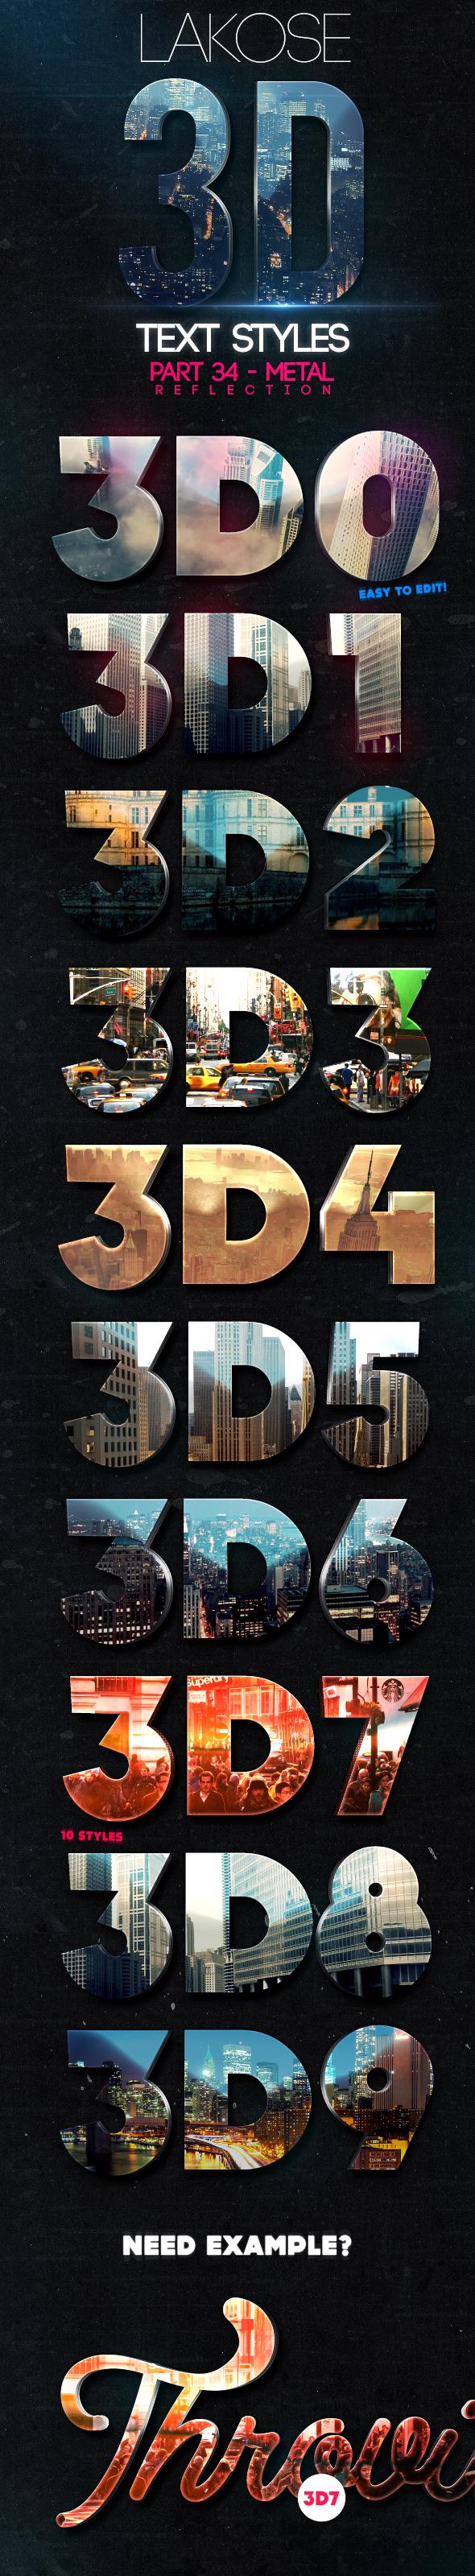 Lakose 3D Text Styles Part 34 - Text Effects Styles